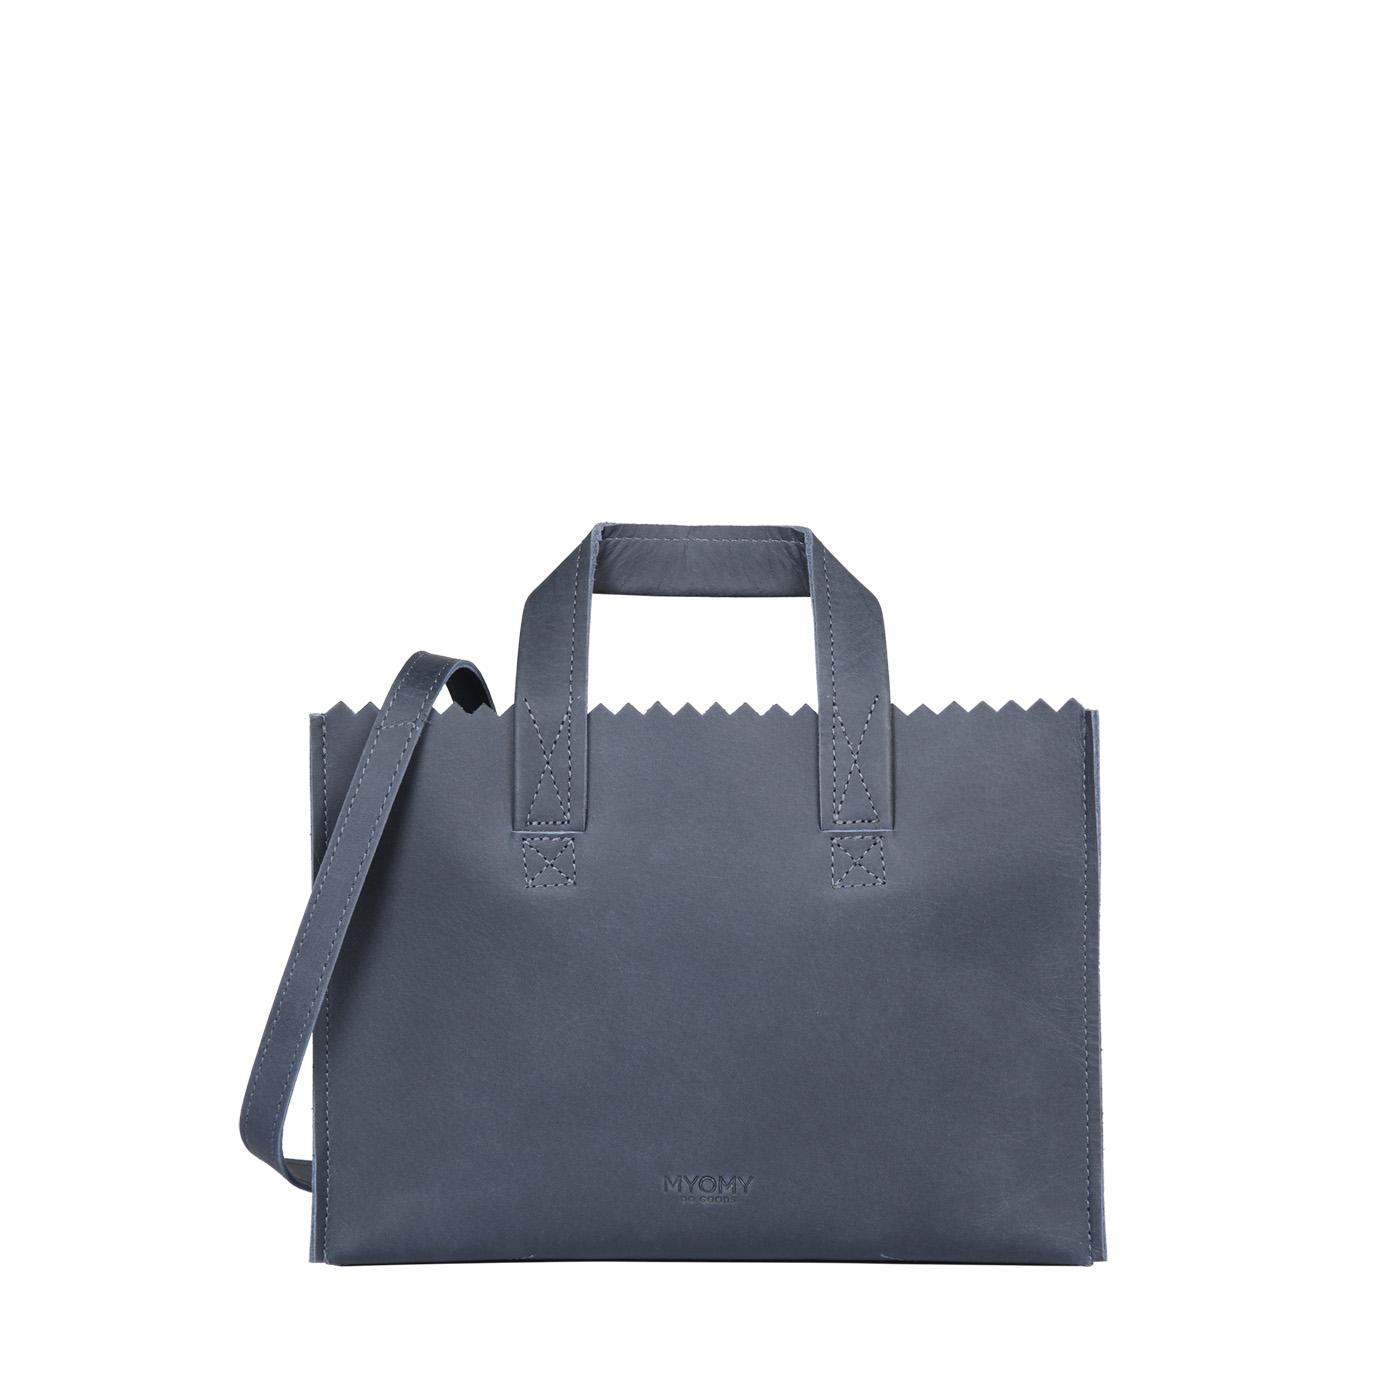 MY PAPER BAG Mini handbag cross-body - hunter navy blue